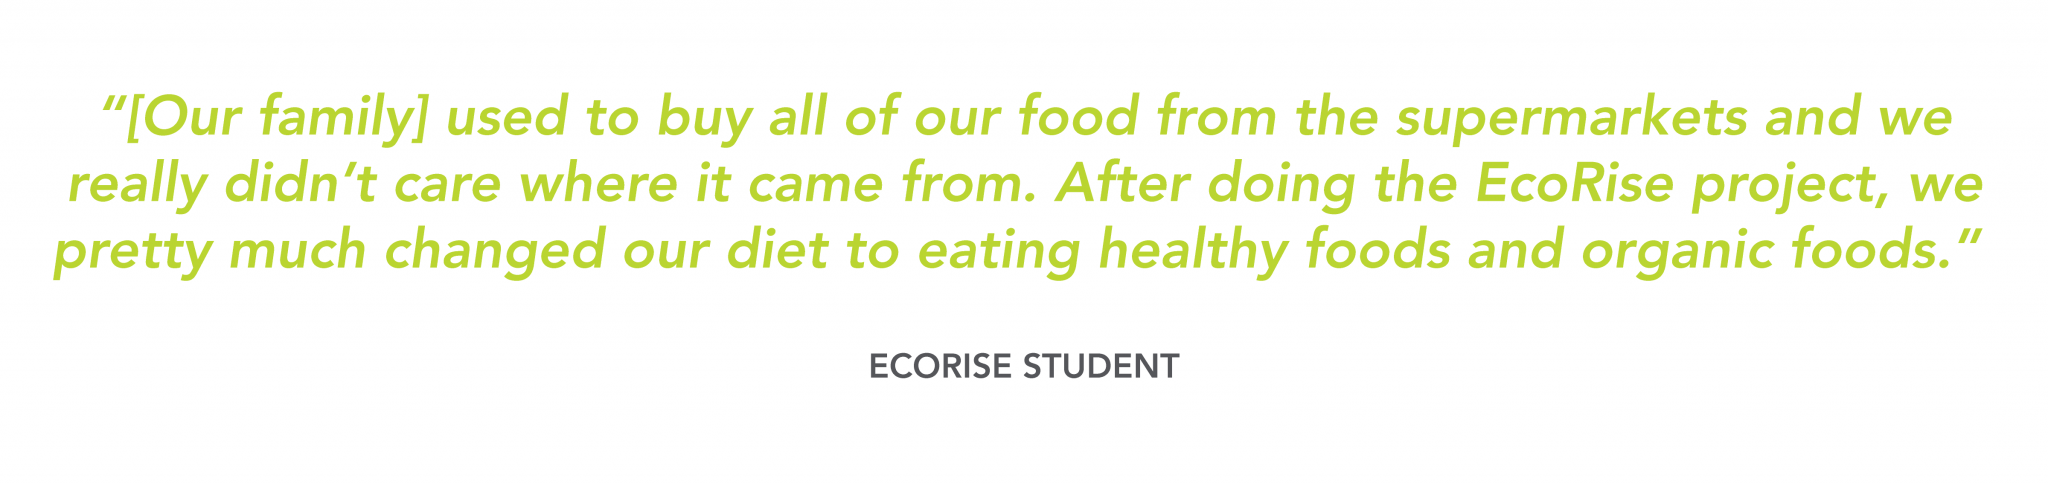 EcoRise Student testimonial